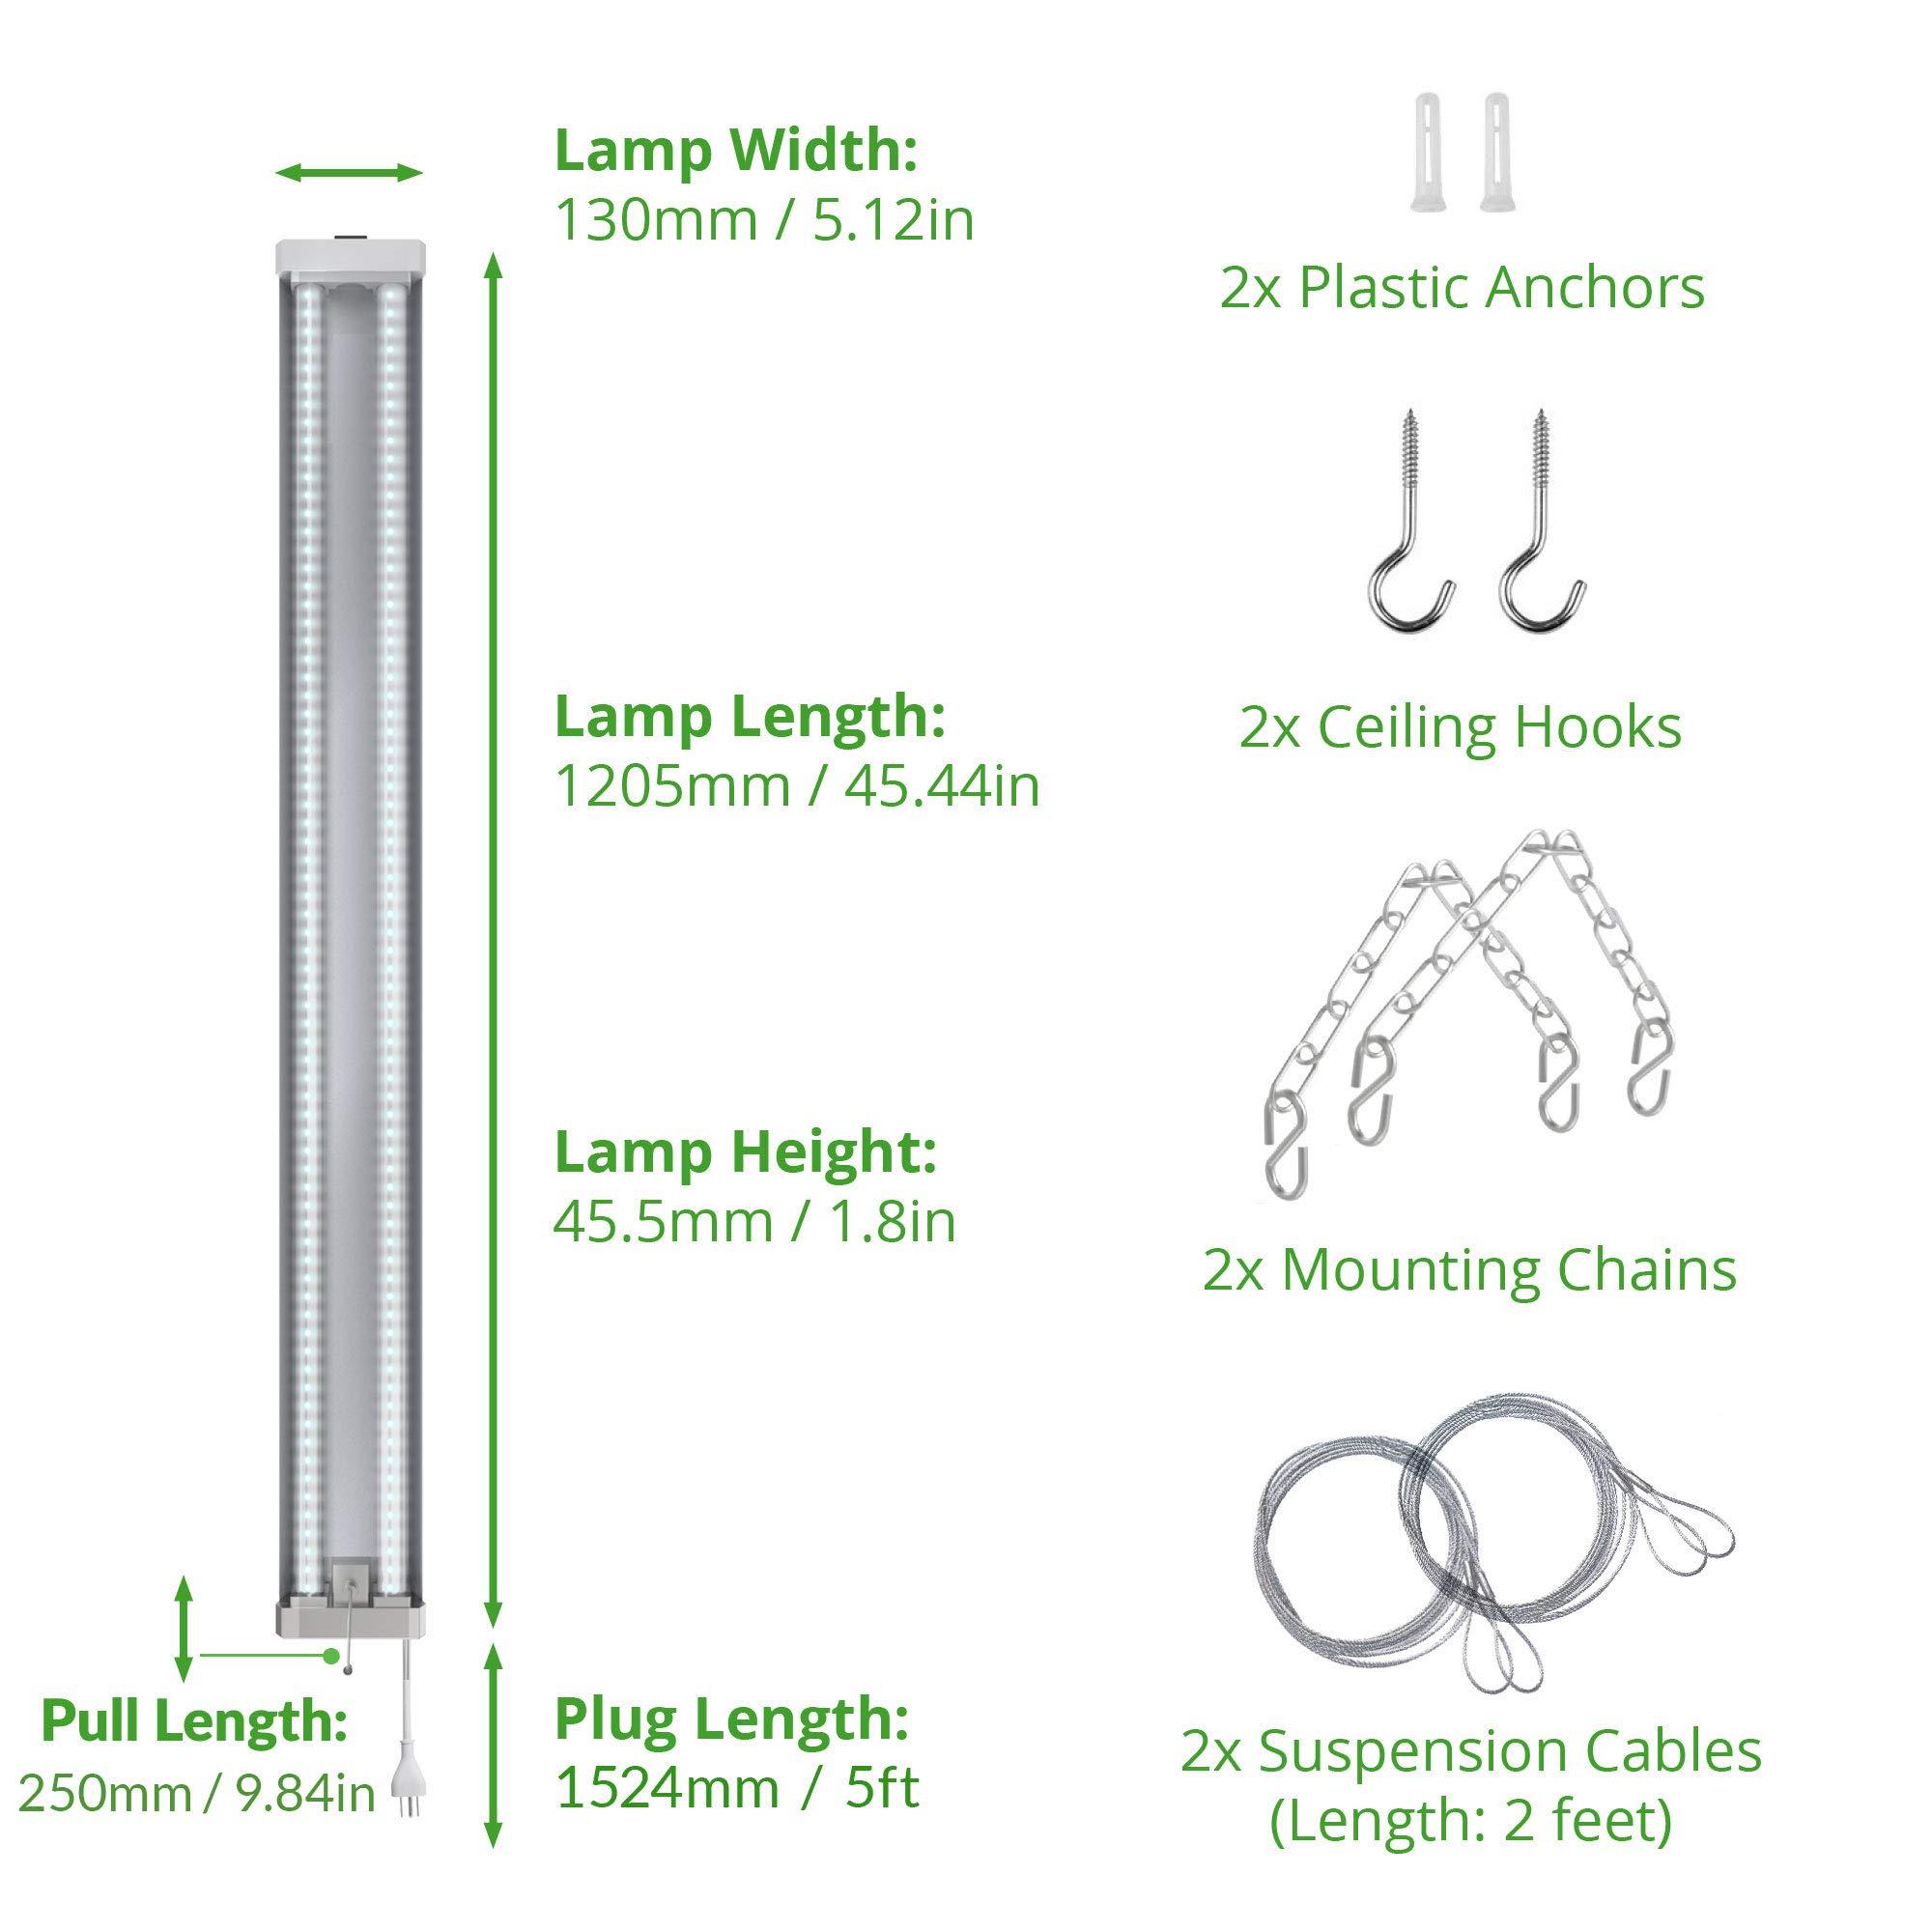 Sunco Lighting 4 Pack 4ft 48 Inch LED Utility Shop Light 40W (260W Equivalent) 5000K Kelvin Daylight, 4500 Lumens, Double Integrated Linkable Garage Ceiling Fixture, Clear Lens - Energy Star/ETL by Sunco Lighting (Image #4)